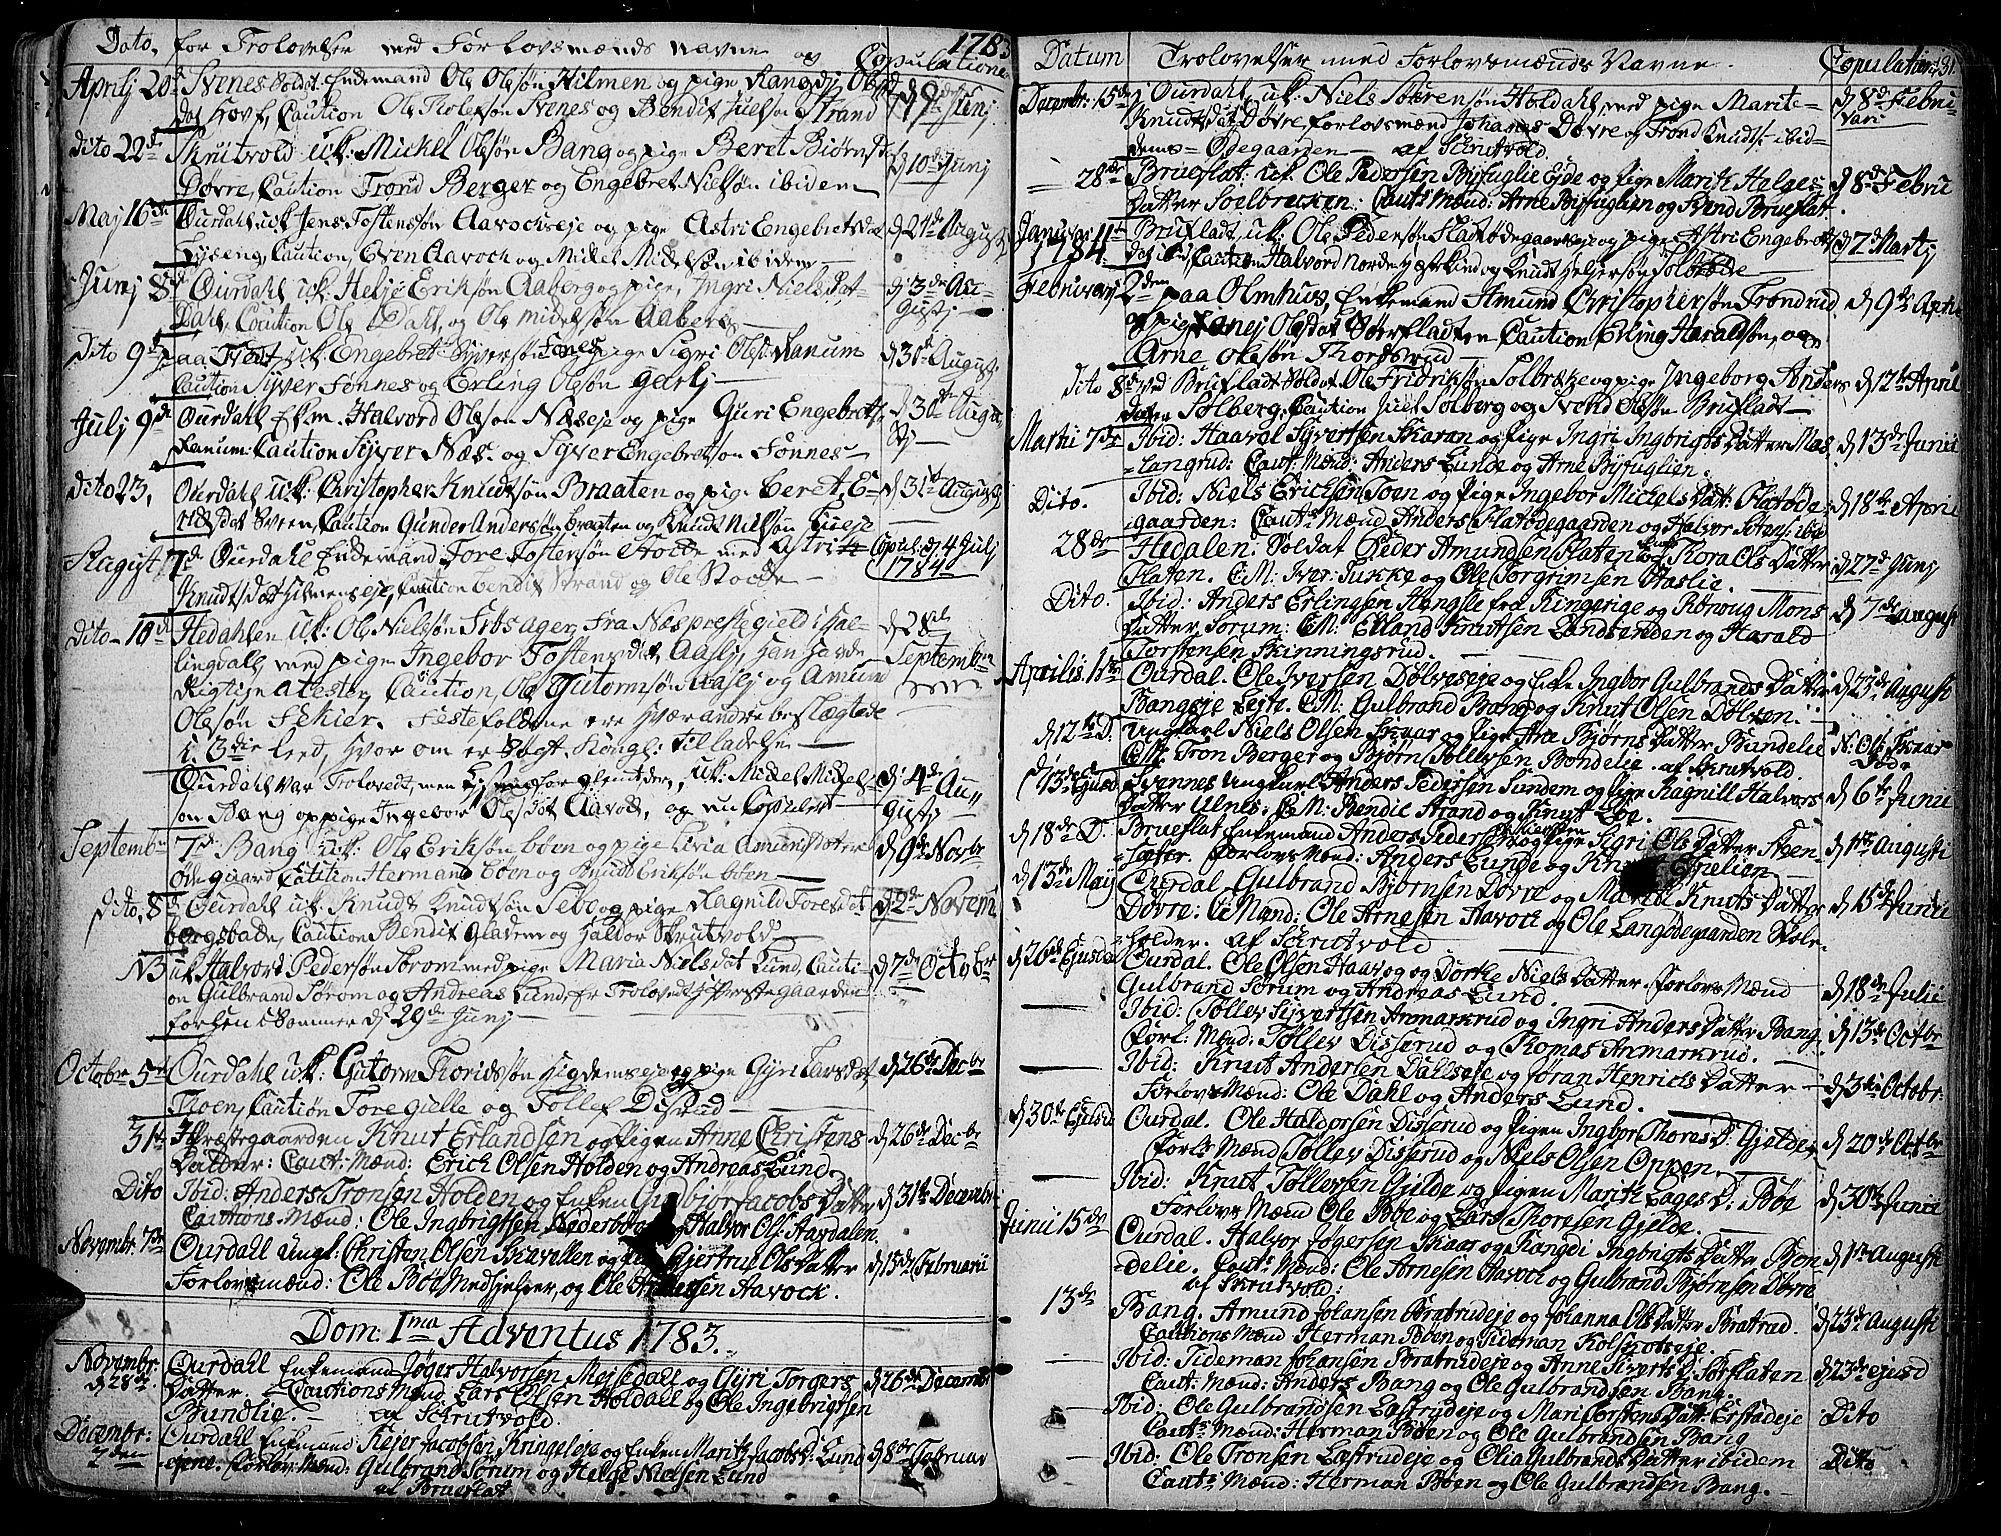 SAH, Aurdal prestekontor, Ministerialbok nr. 6, 1781-1804, s. 131